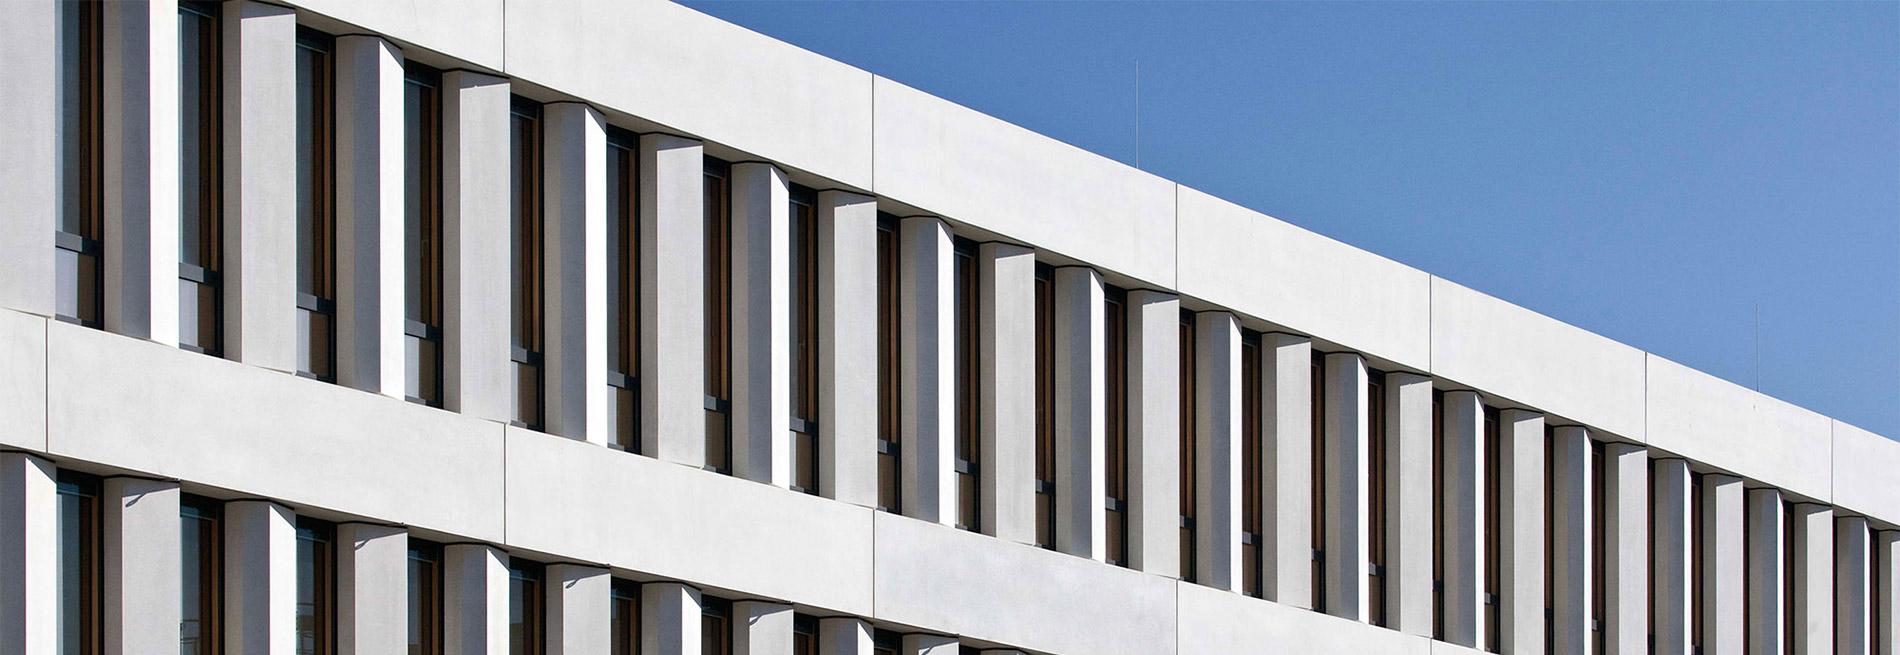 Hoenninger Architekturbeton